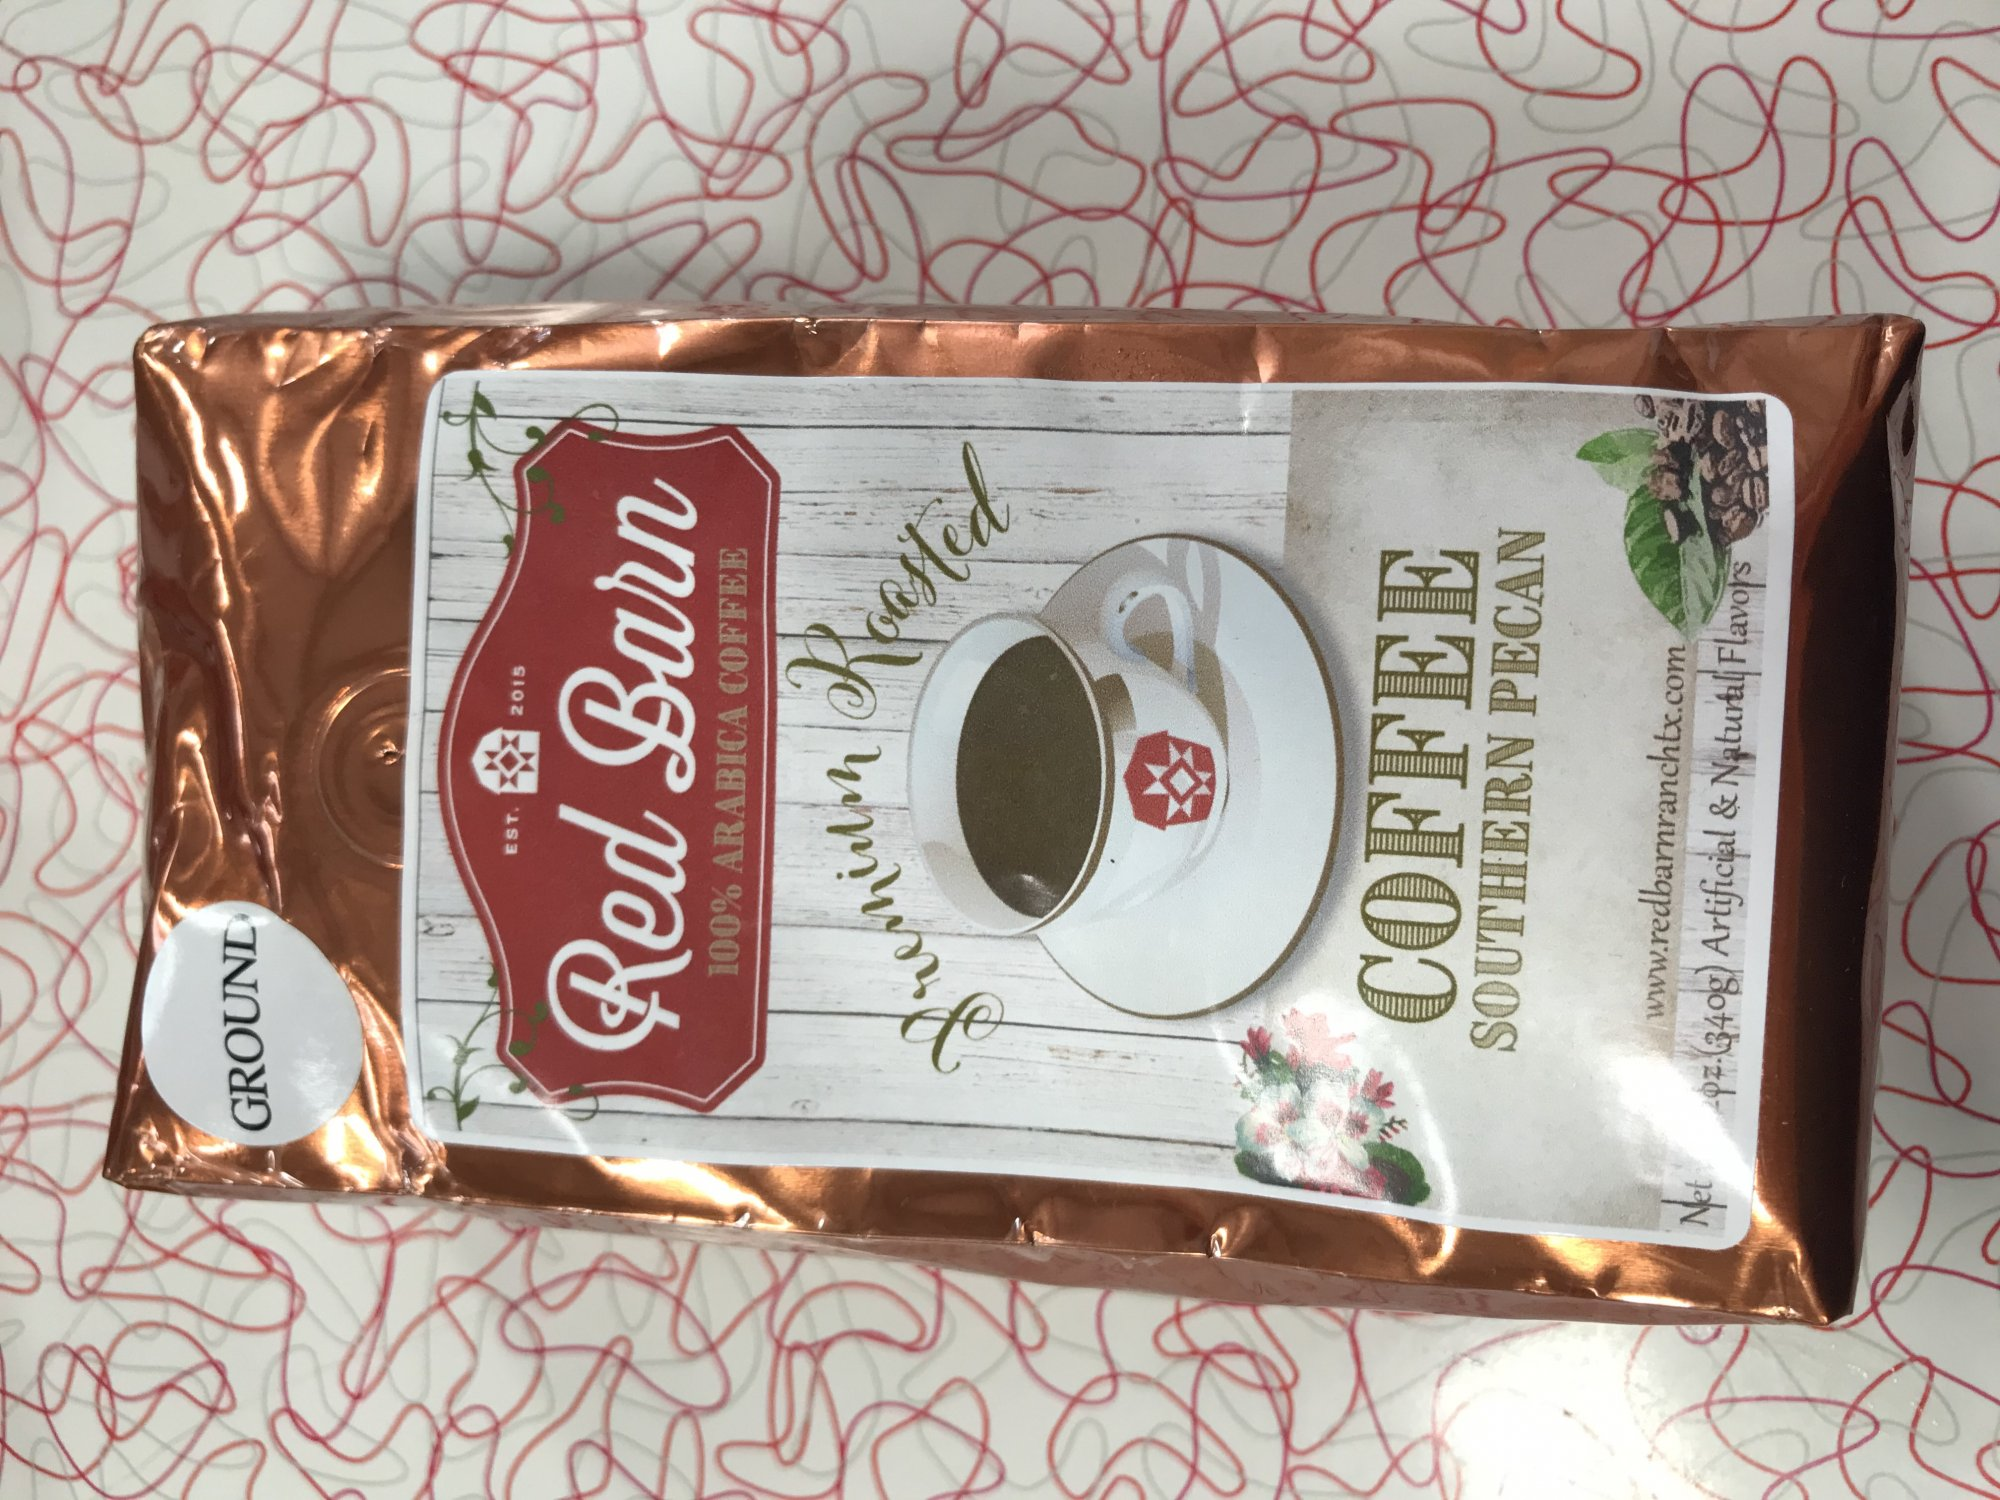 RB Coffee,Snicker-Roo 12 oz Bag